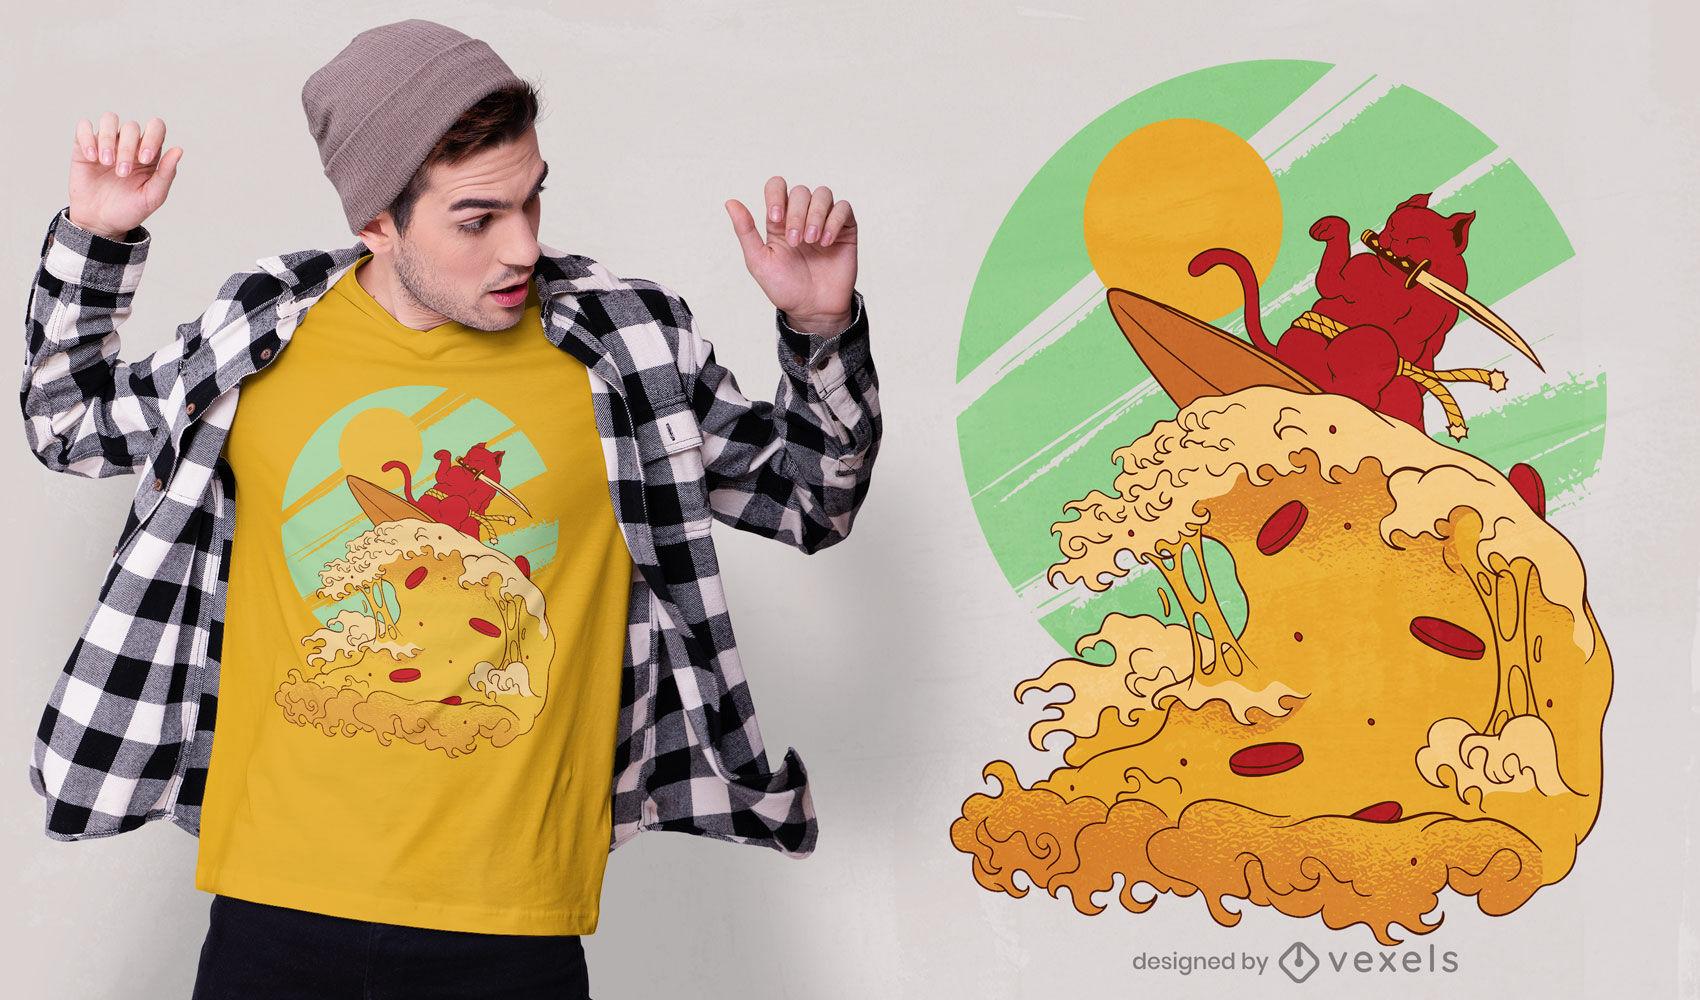 Japanese cat surfing pizza wave t-shirt design